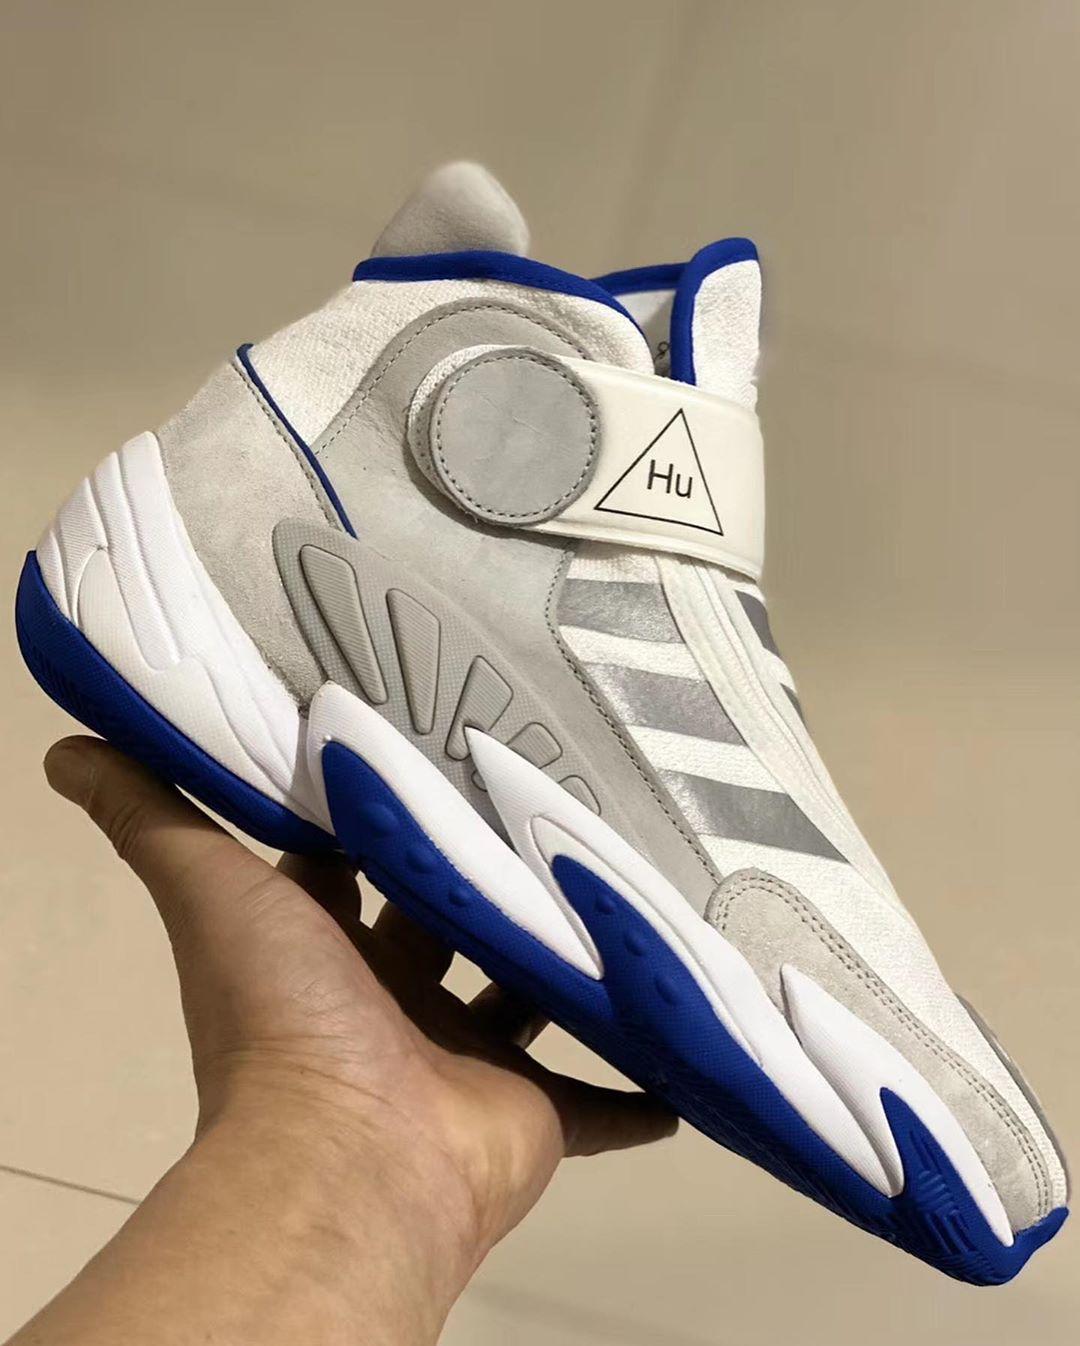 Pharrell Williams x adidas Crazy BYW 2.0 phối màu mới